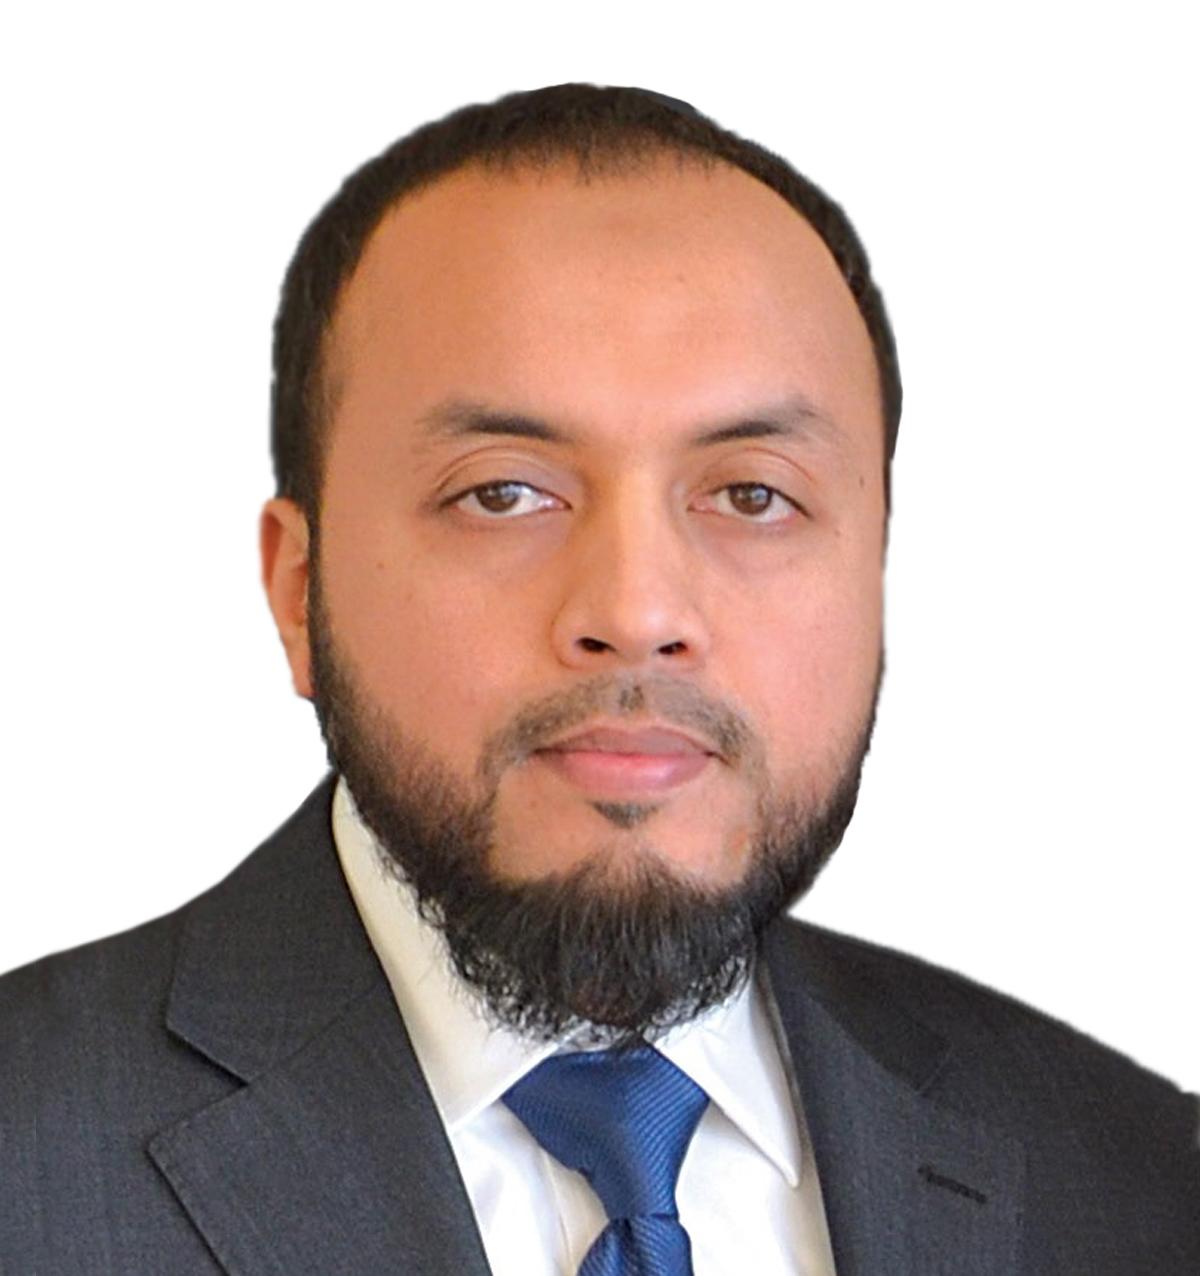 B al-Hasan